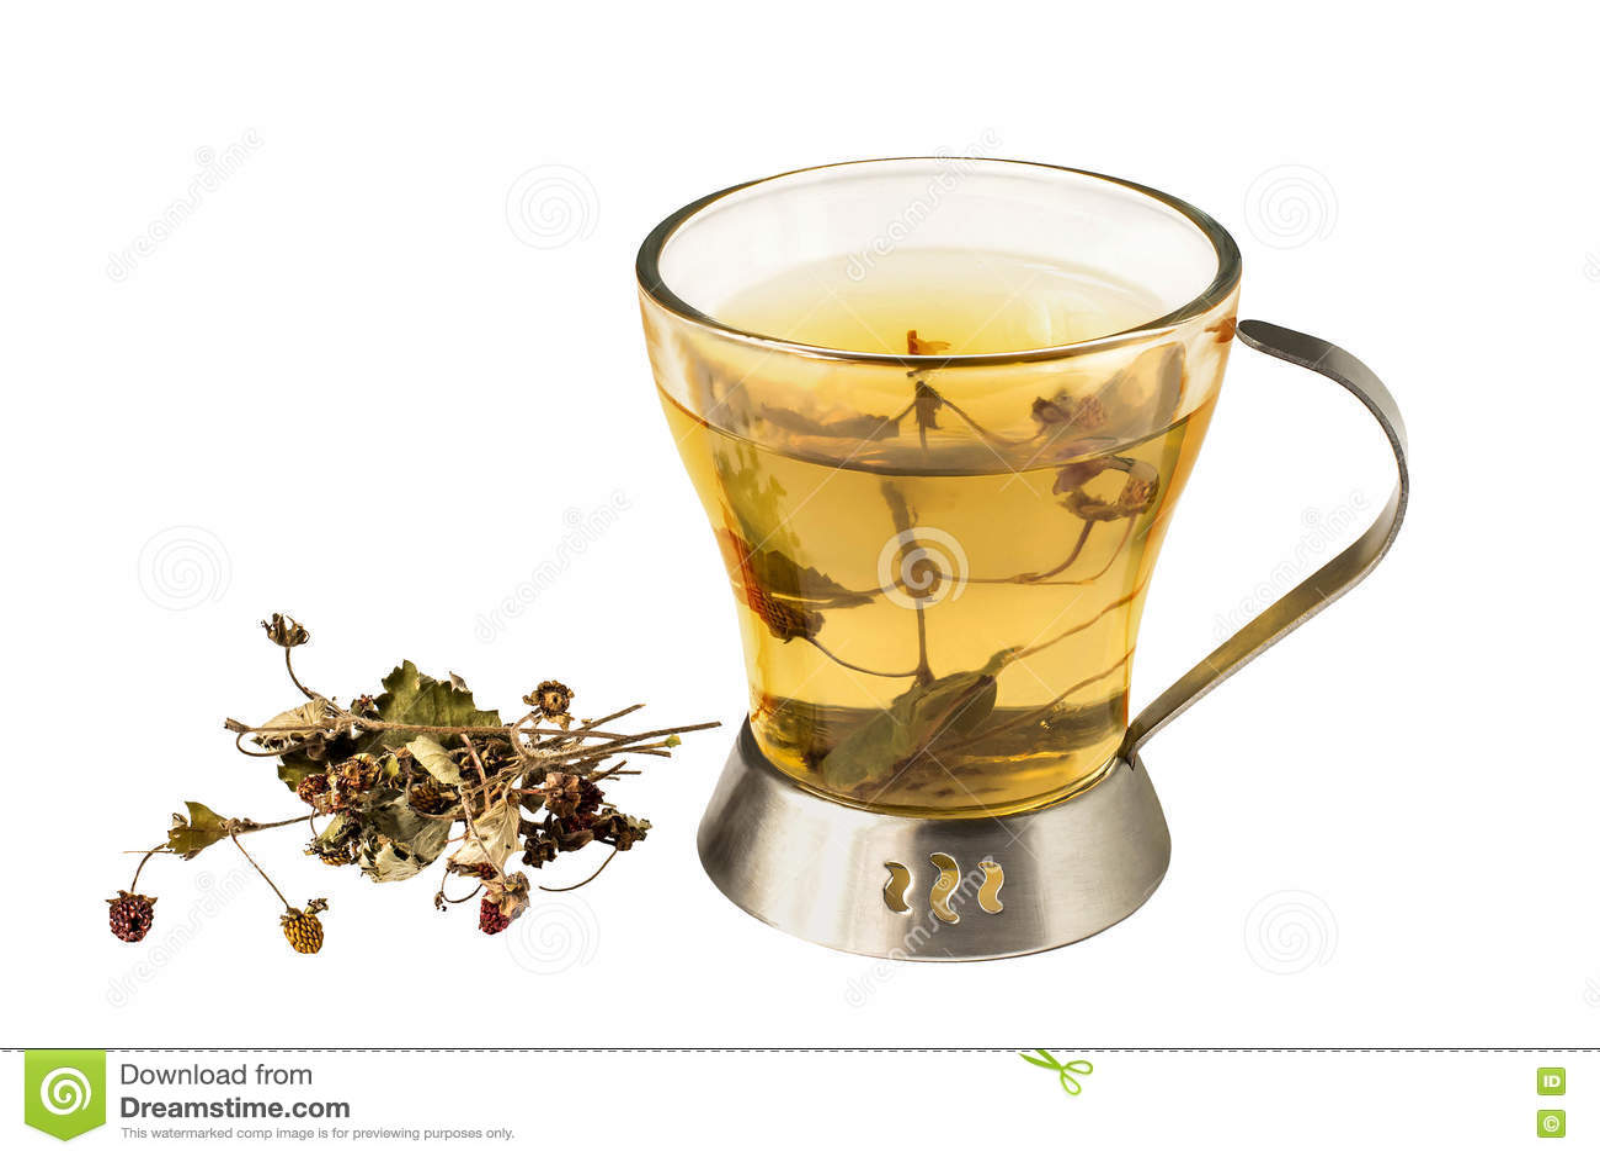 Is tea useful? 71